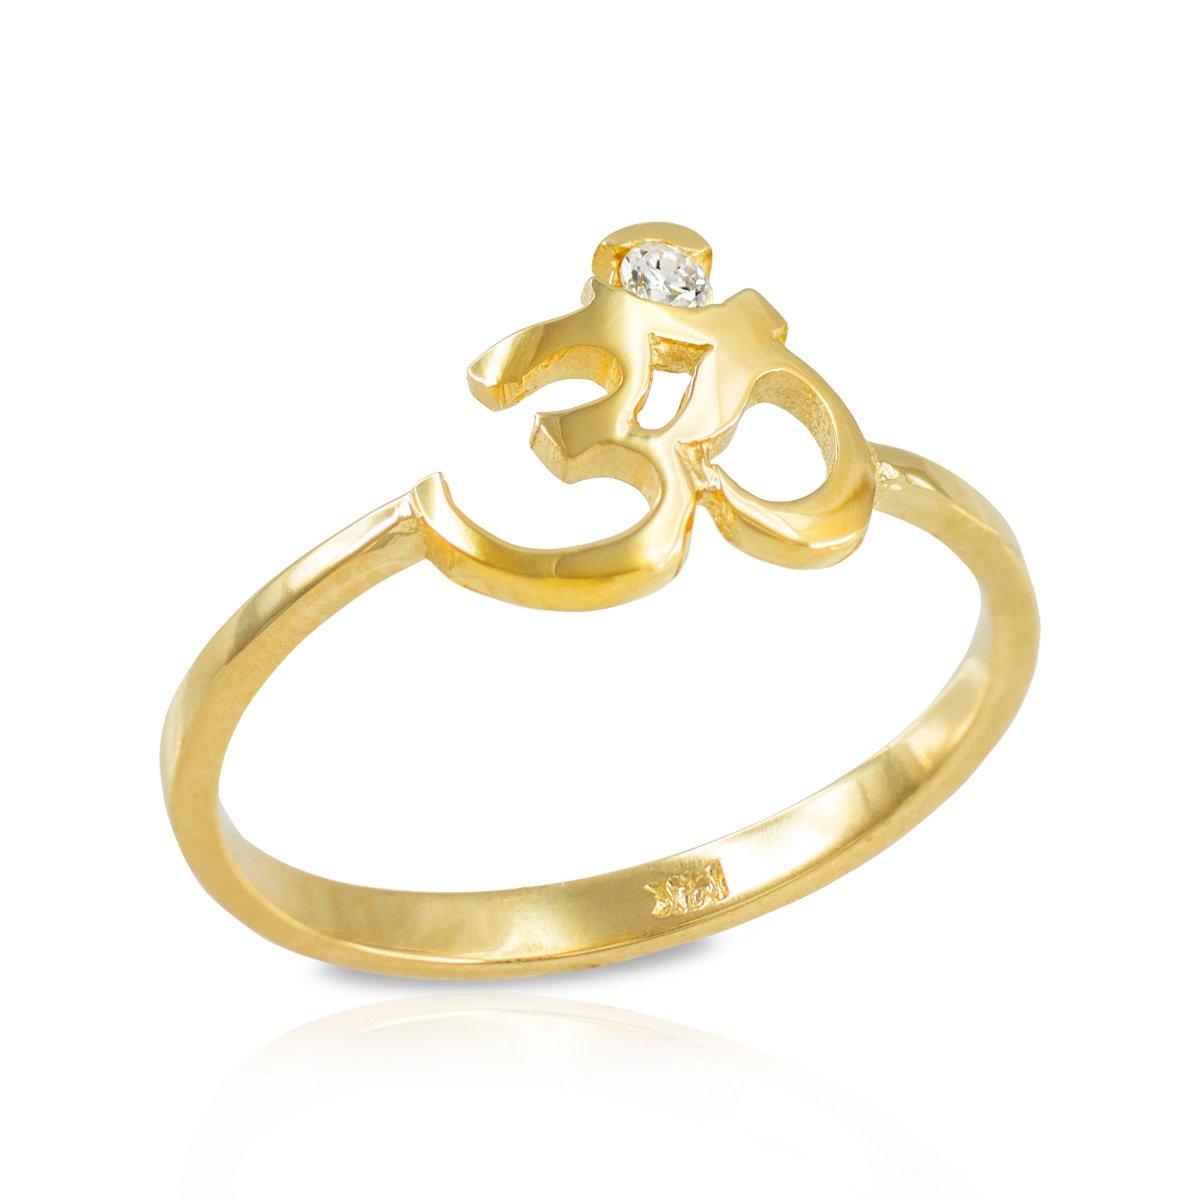 Women's 14k Yellow Gold Dainty Yoga Band Diamond Om Ring (Size 5)